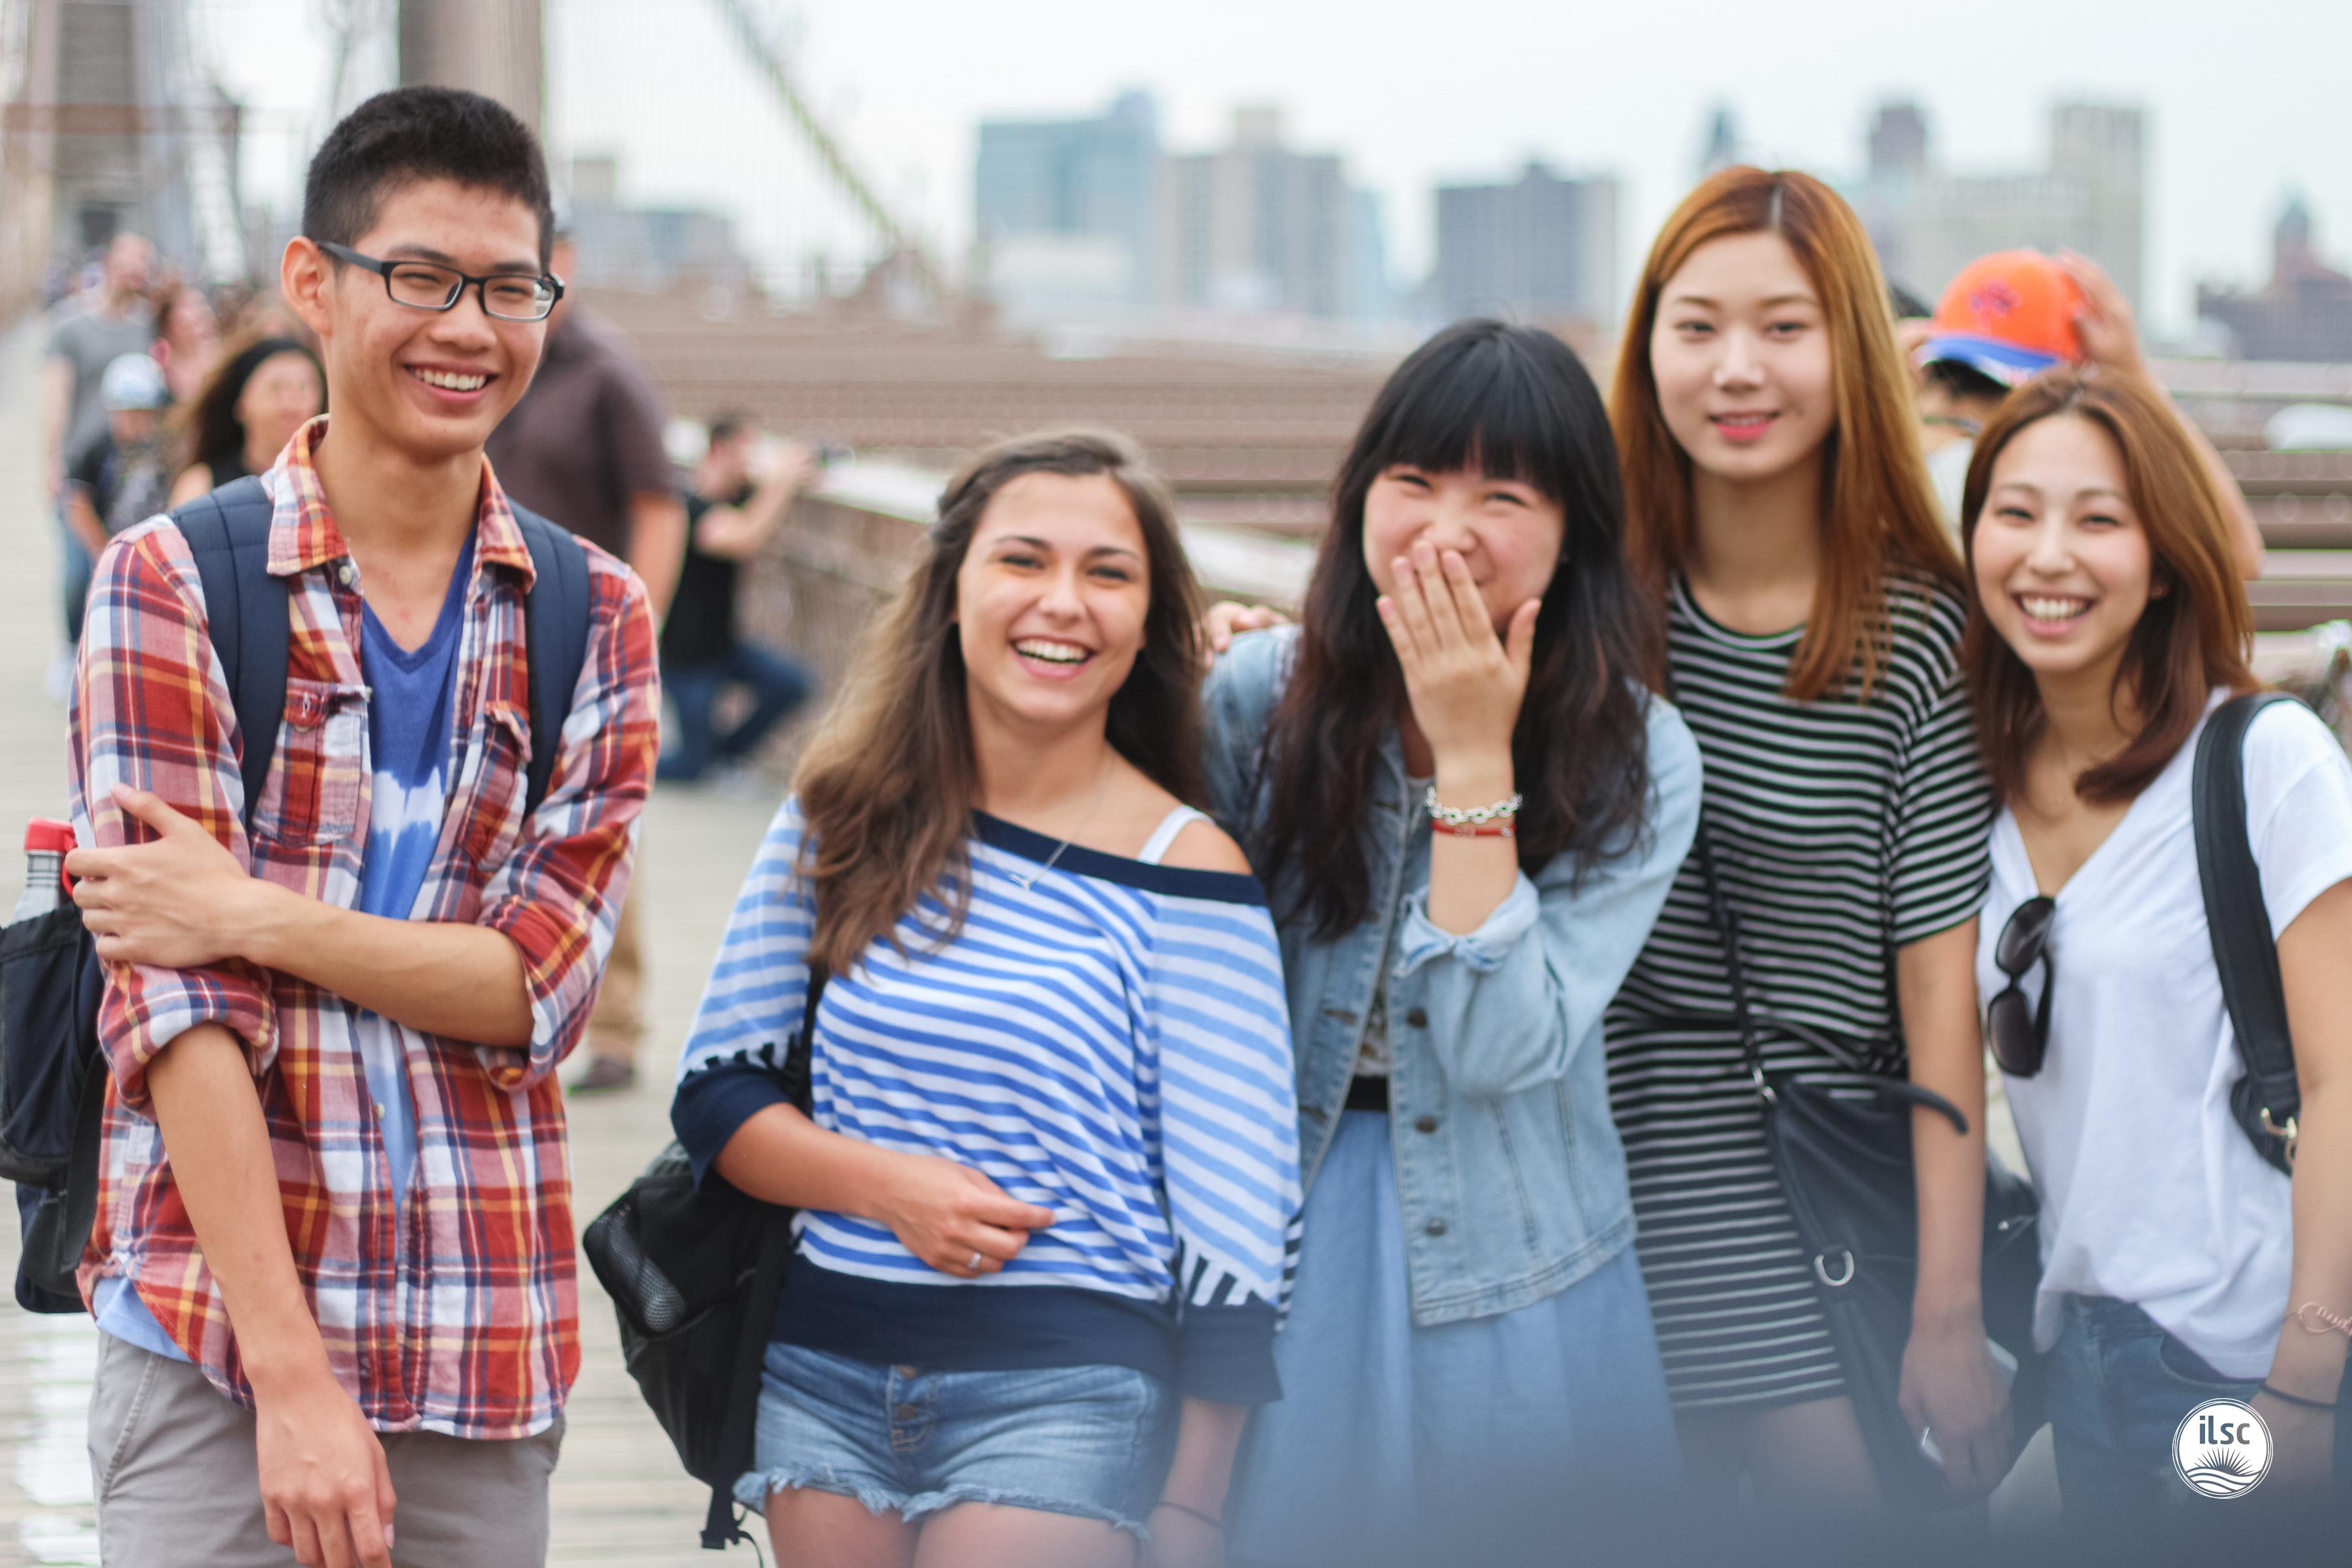 ILSC Language Schools New York Campus